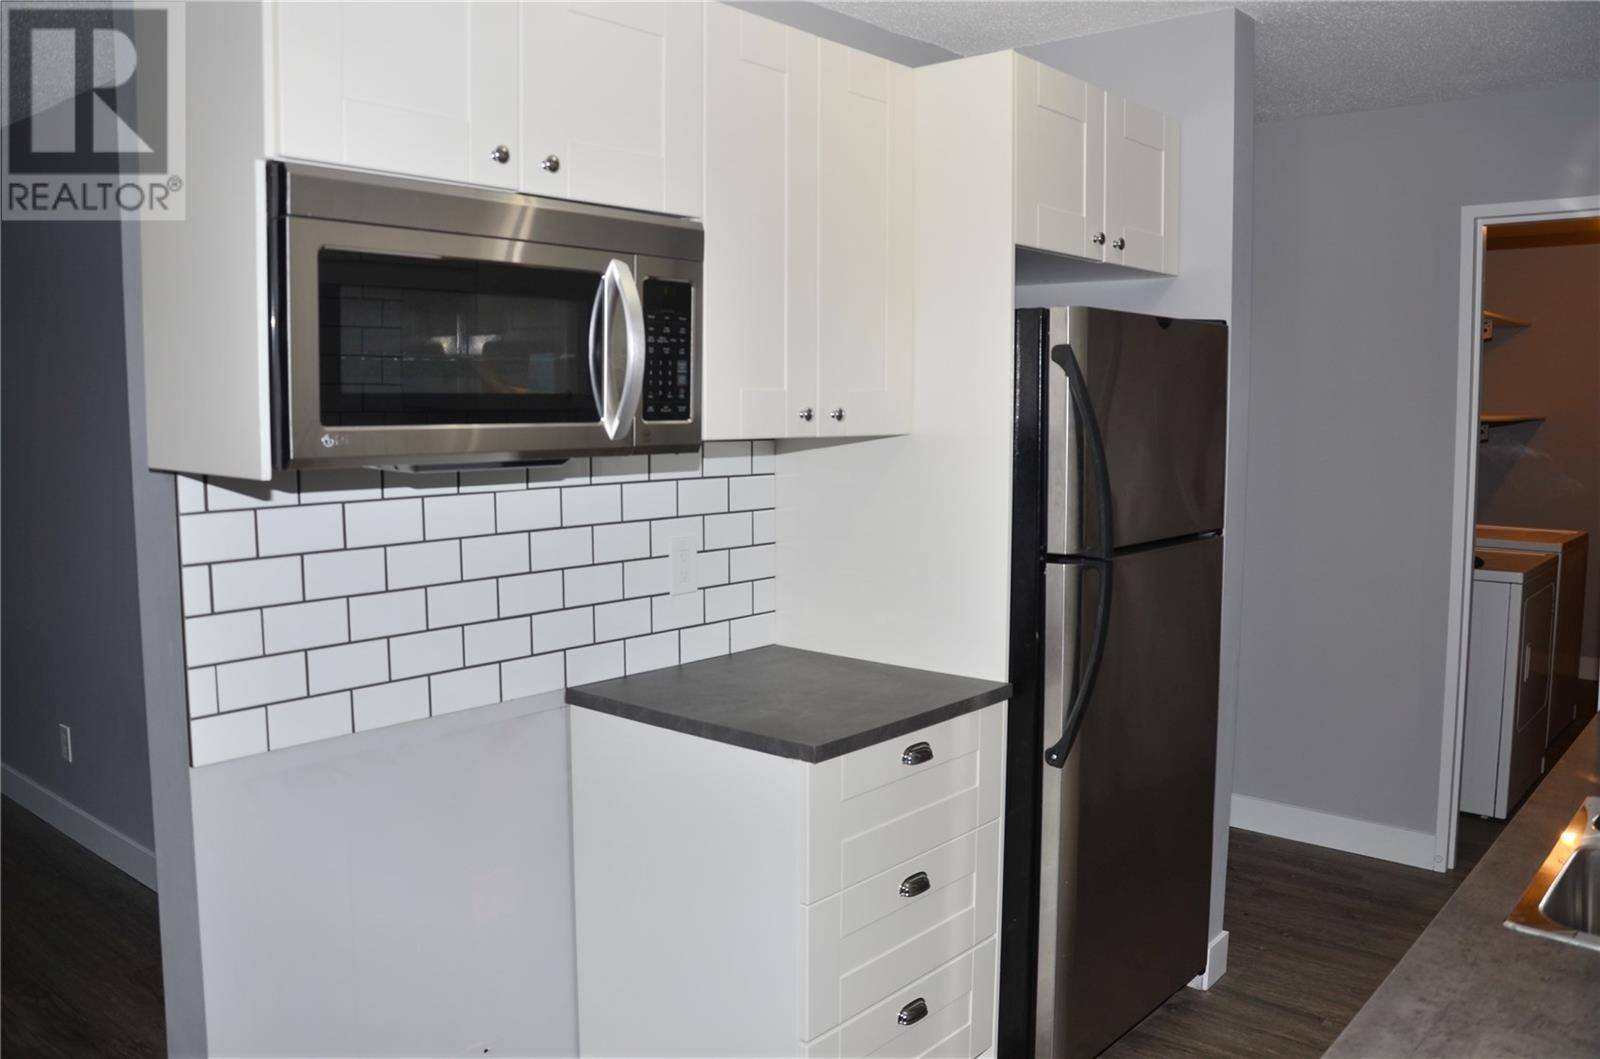 Condo for sale at 425 115th St E Unit 1227 Saskatoon Saskatchewan - MLS: SK790378